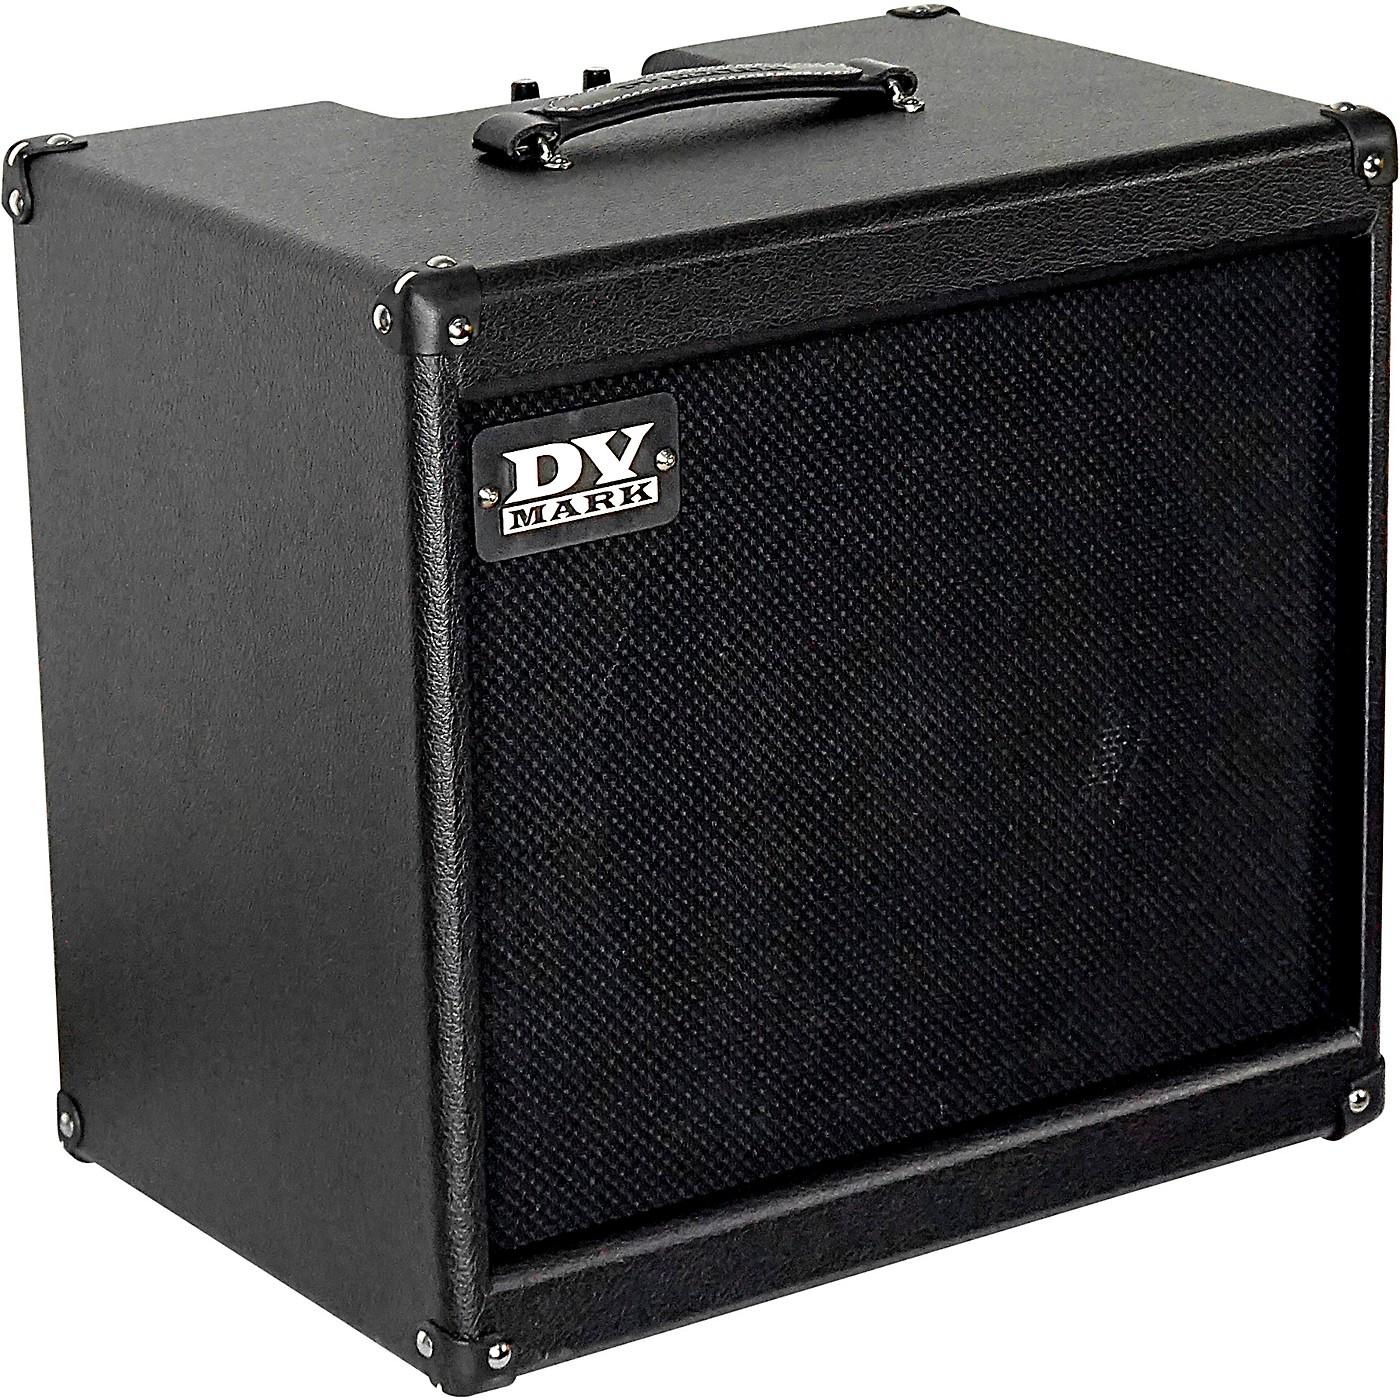 DV Mark DV Powered Cab 60W 1x12 Powered Guitar Speaker Cabinet thumbnail